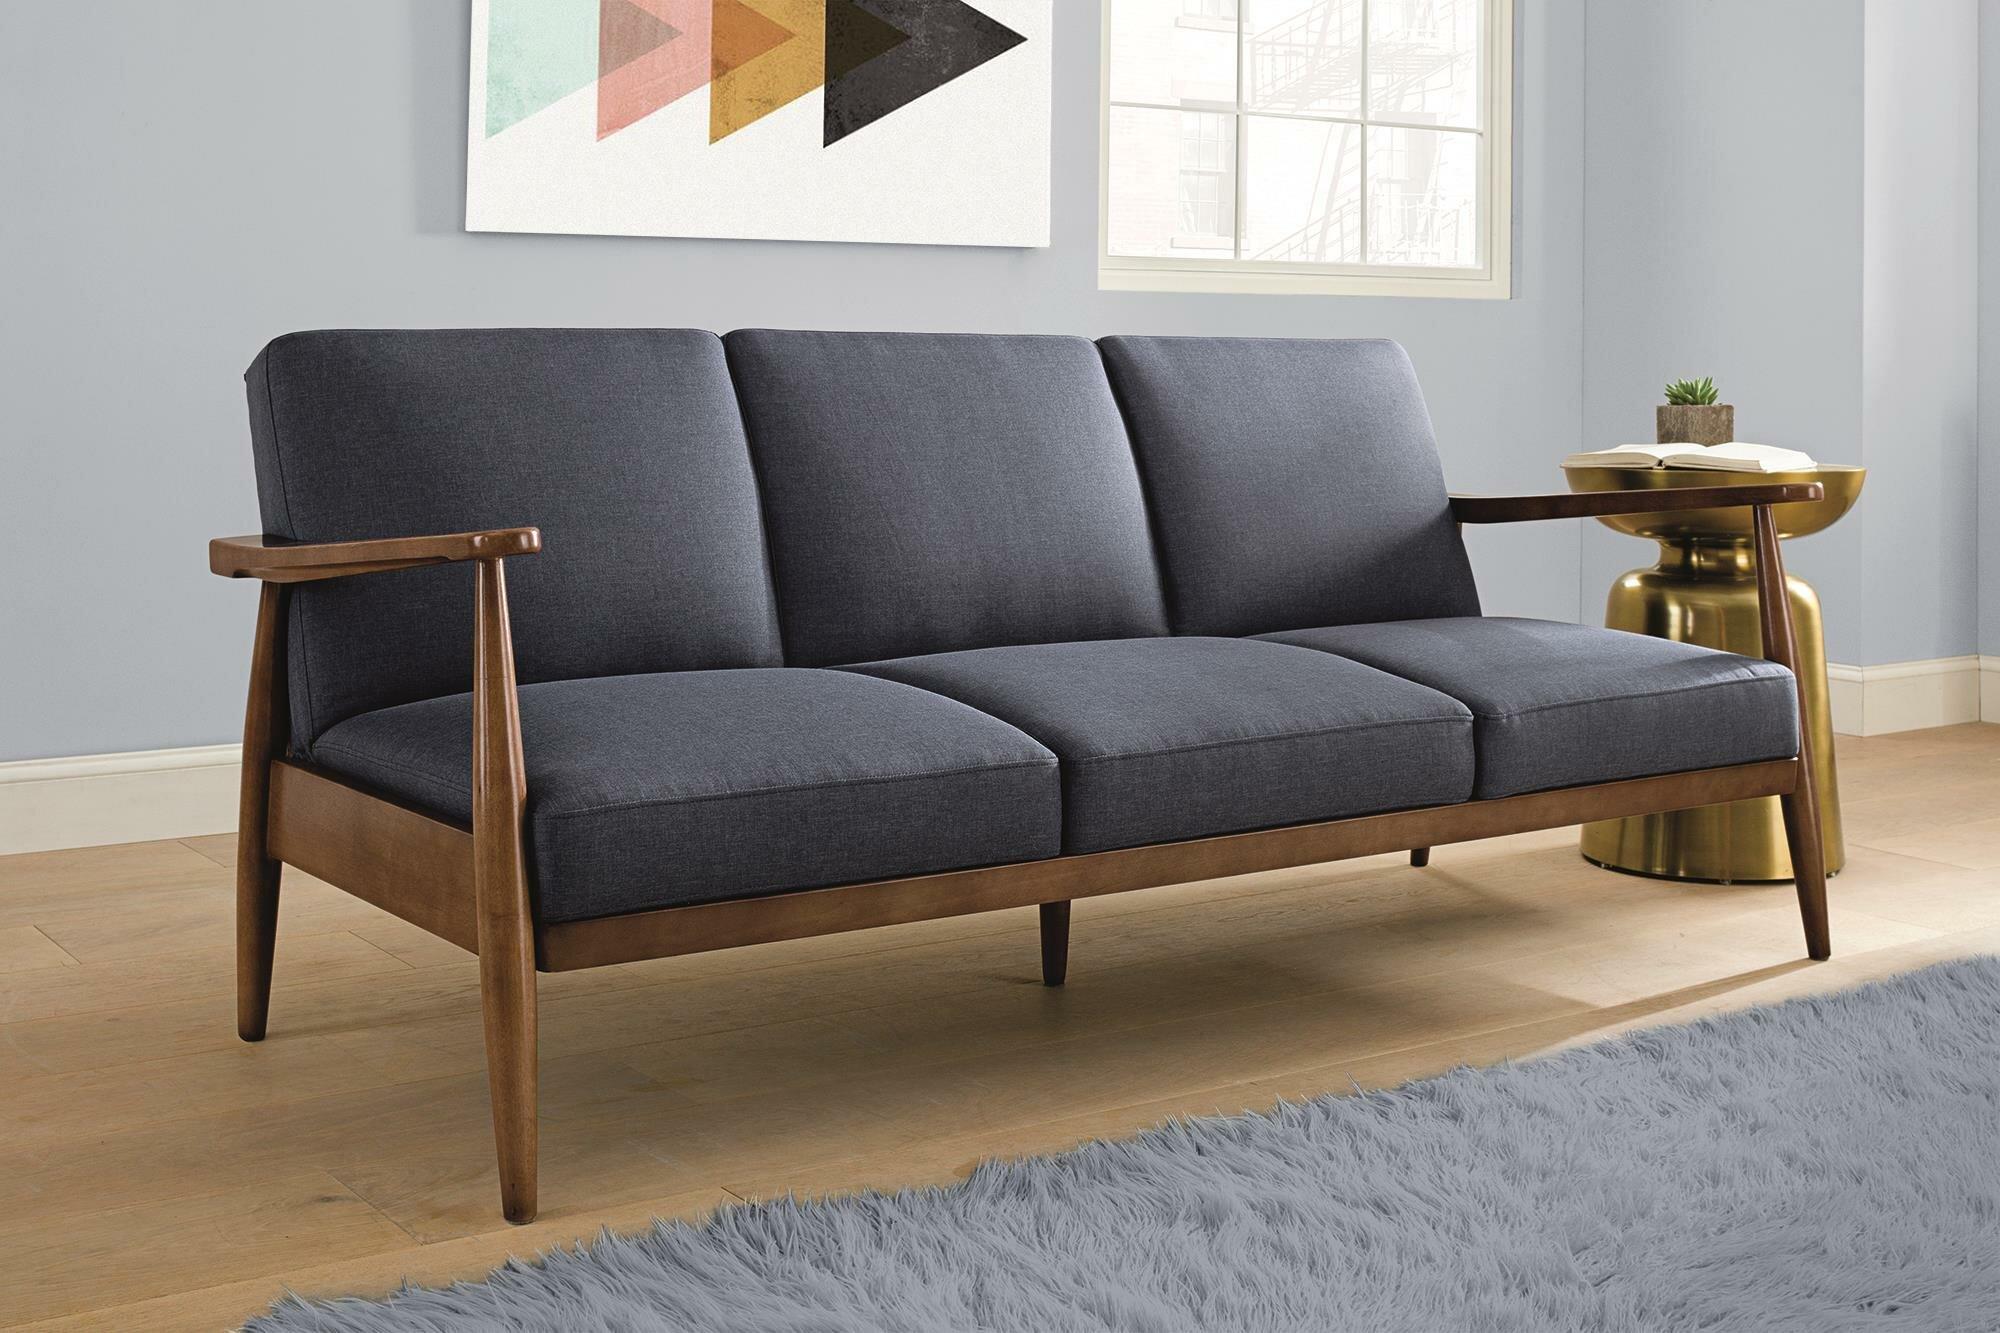 Julia Mid Century Modern Convertible Sofa Reviews Joss Main